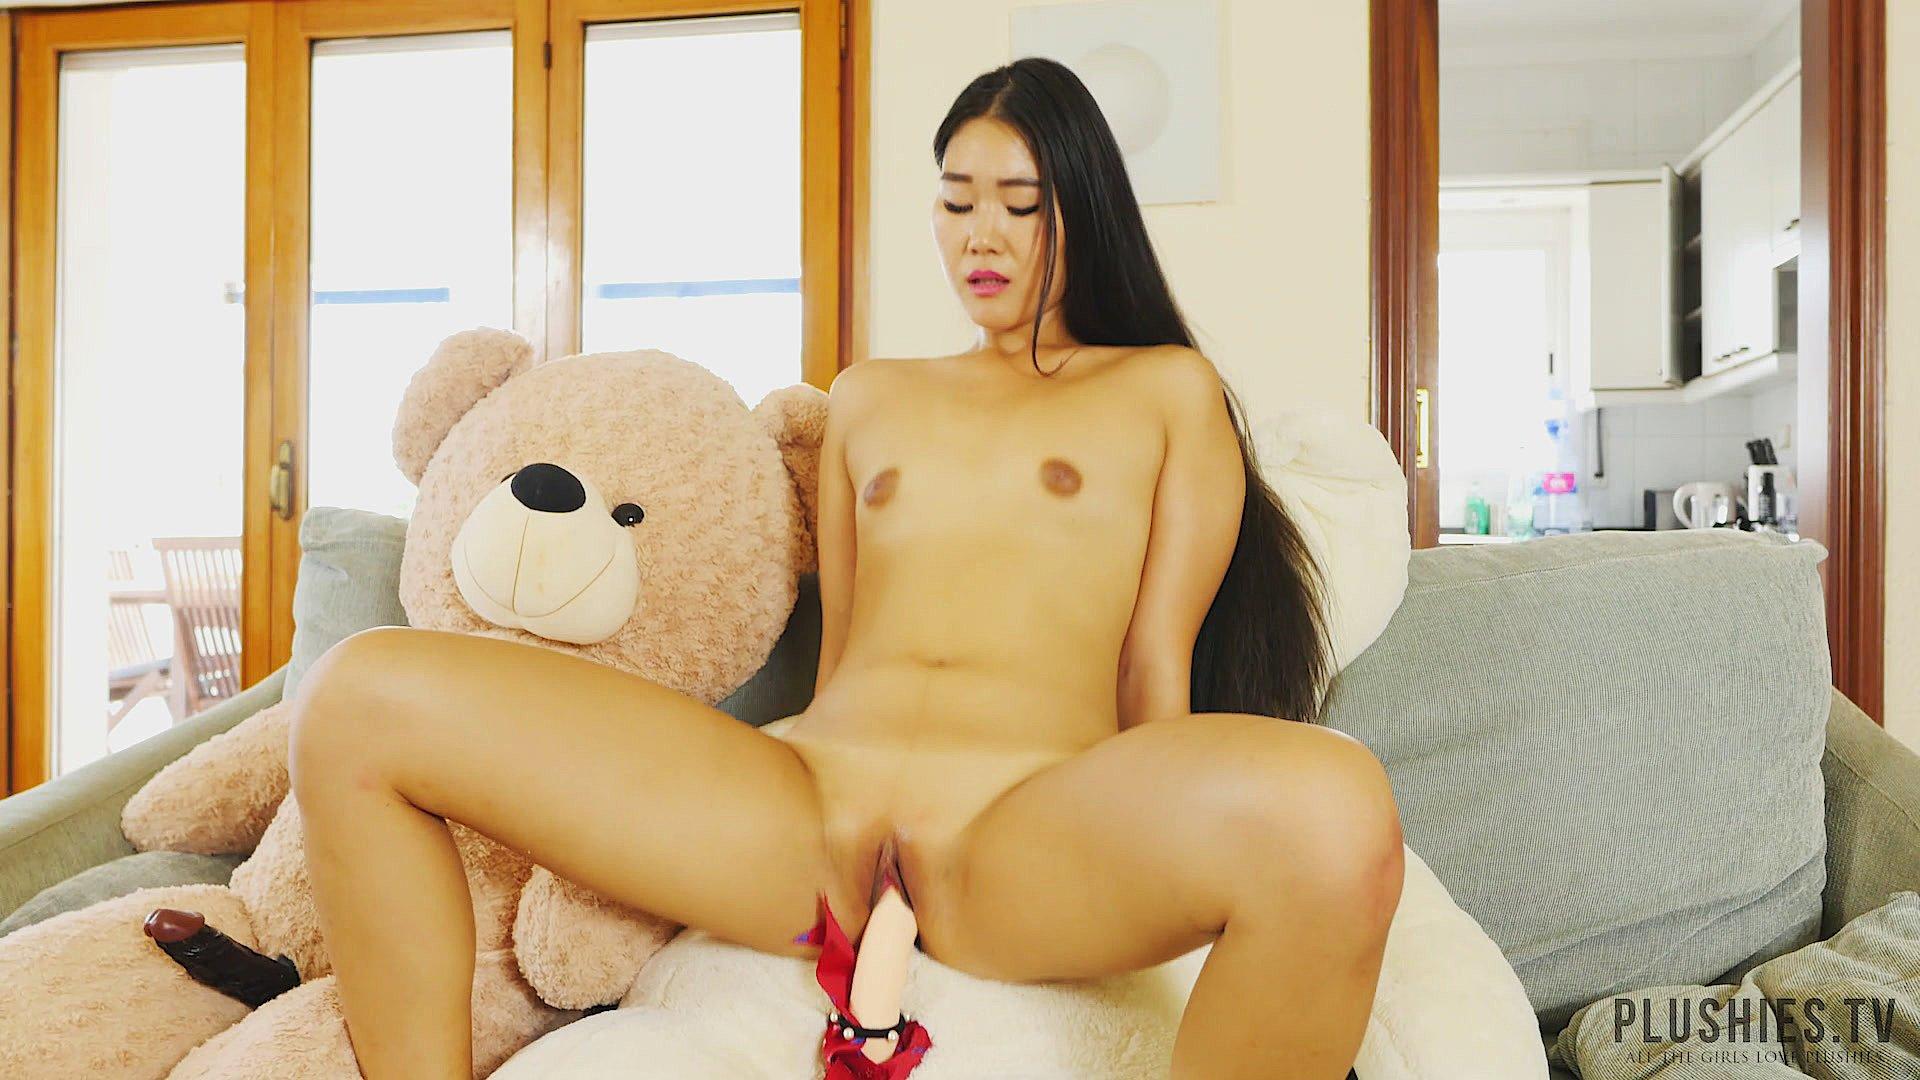 Teen humping her stuffed toy